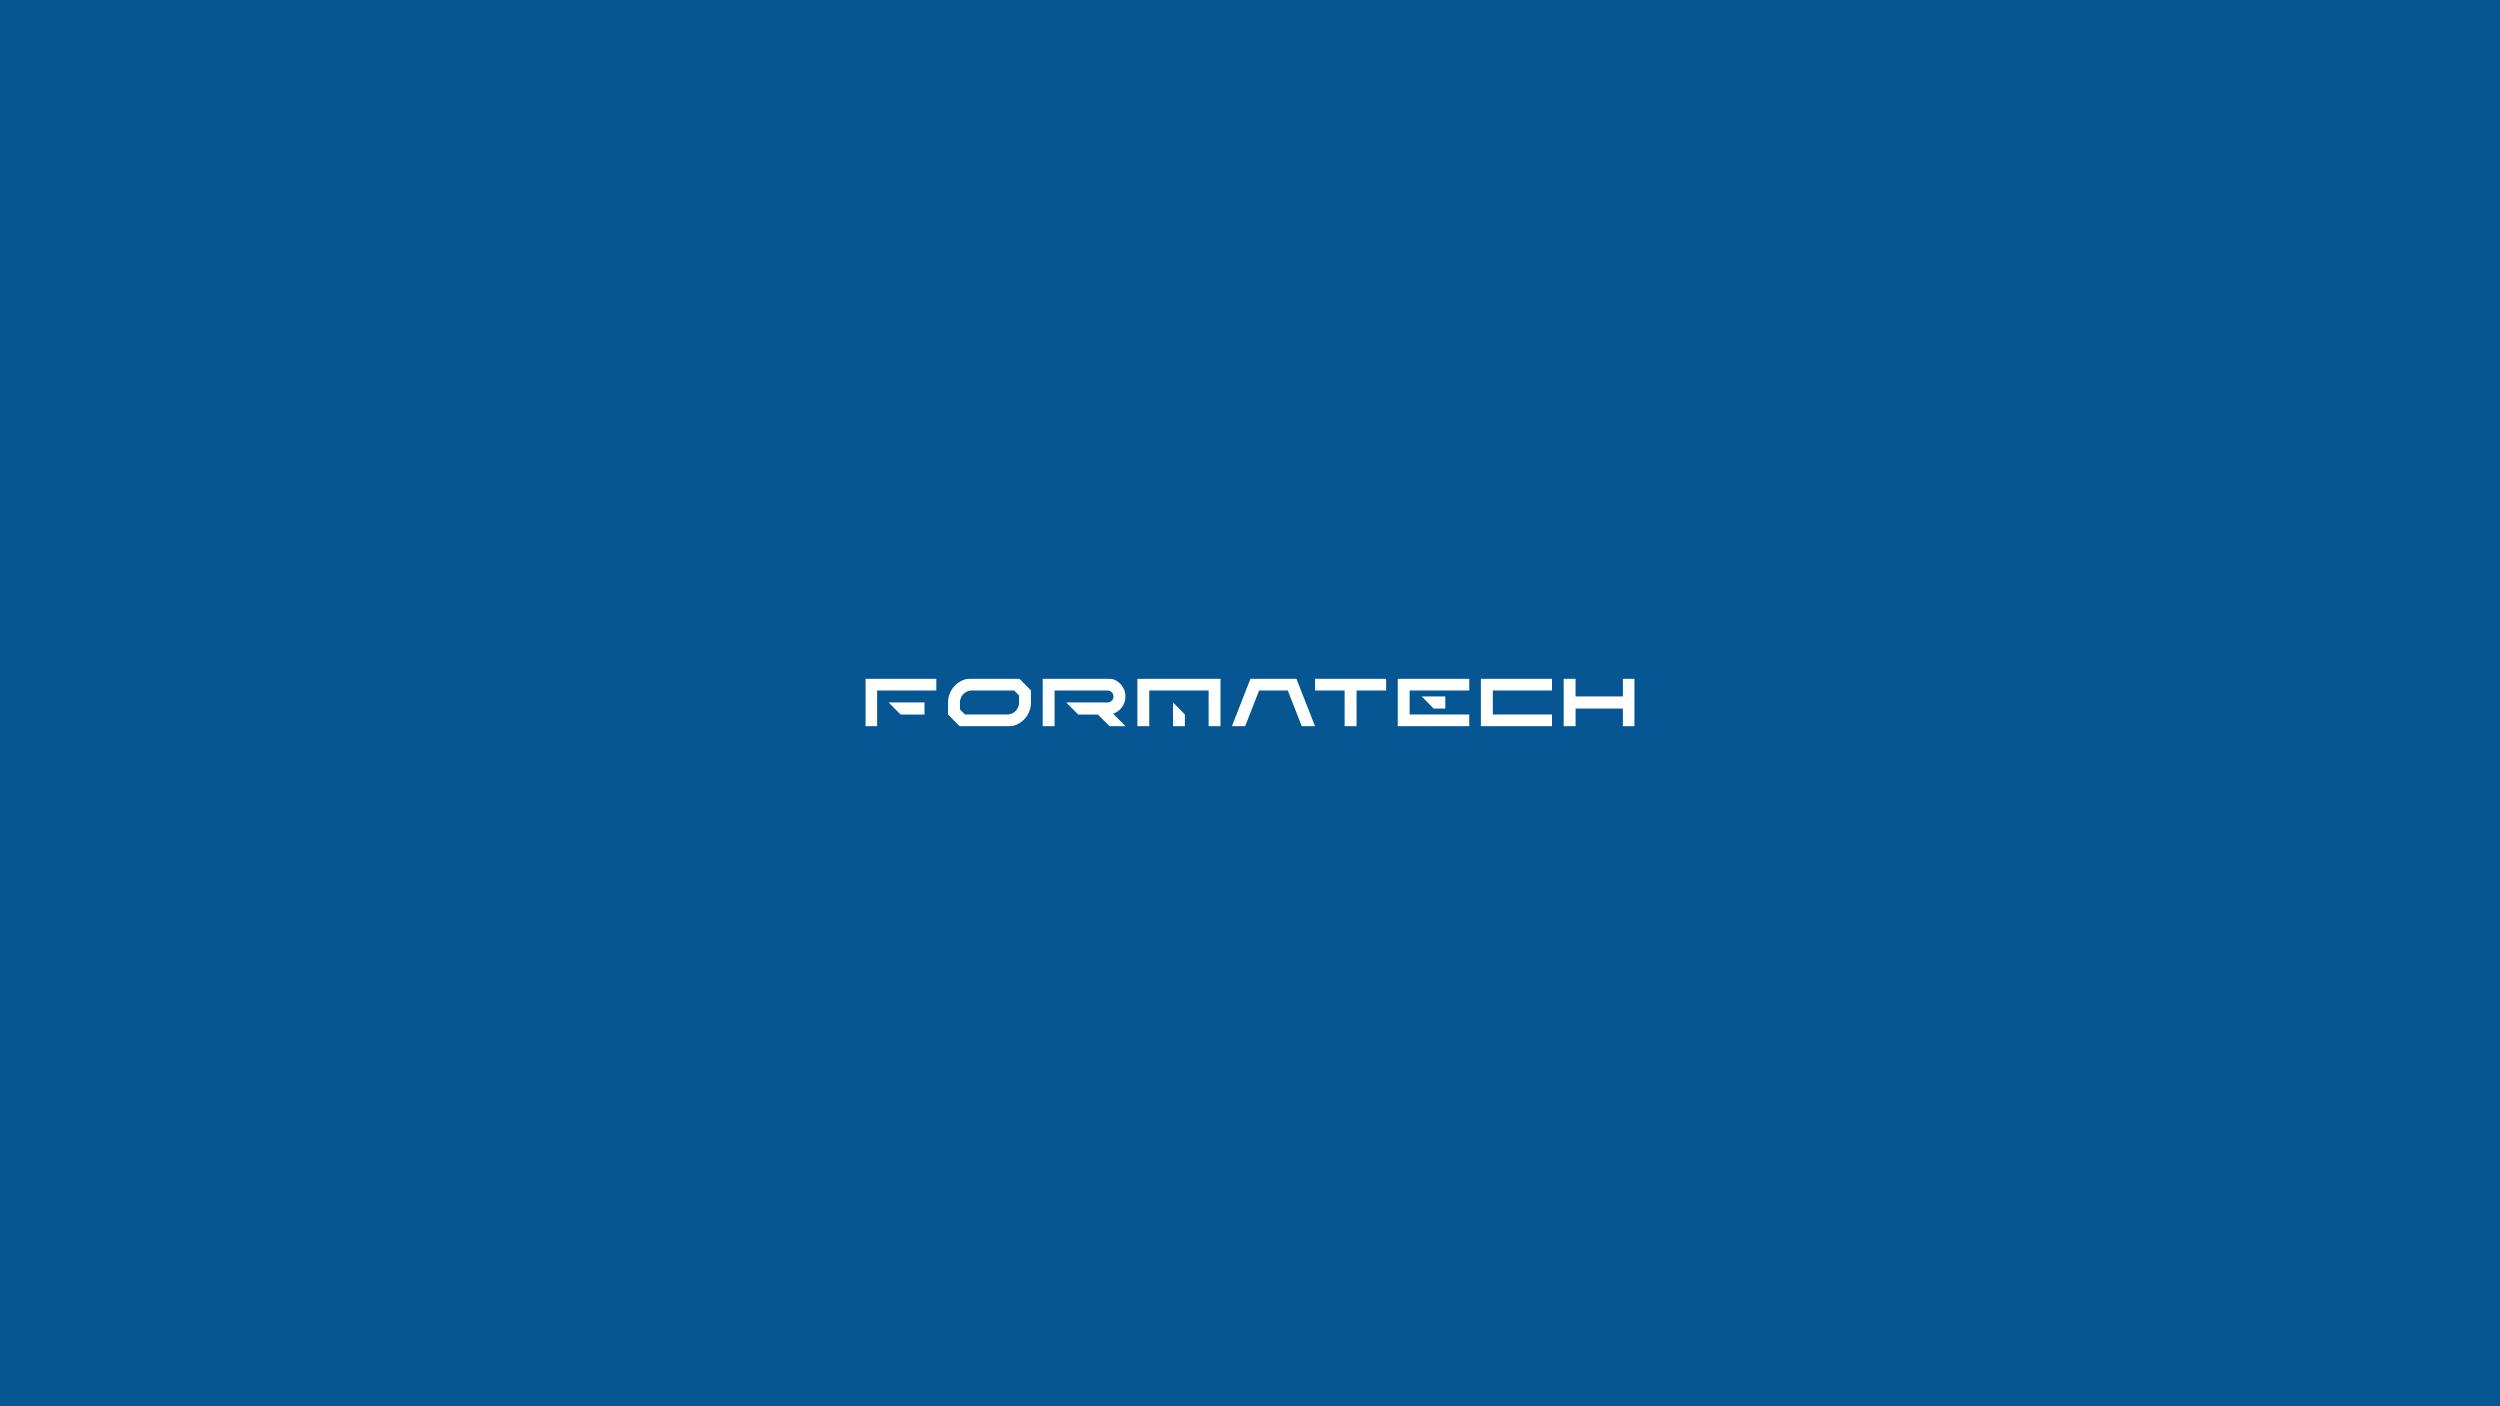 formatech_v_3